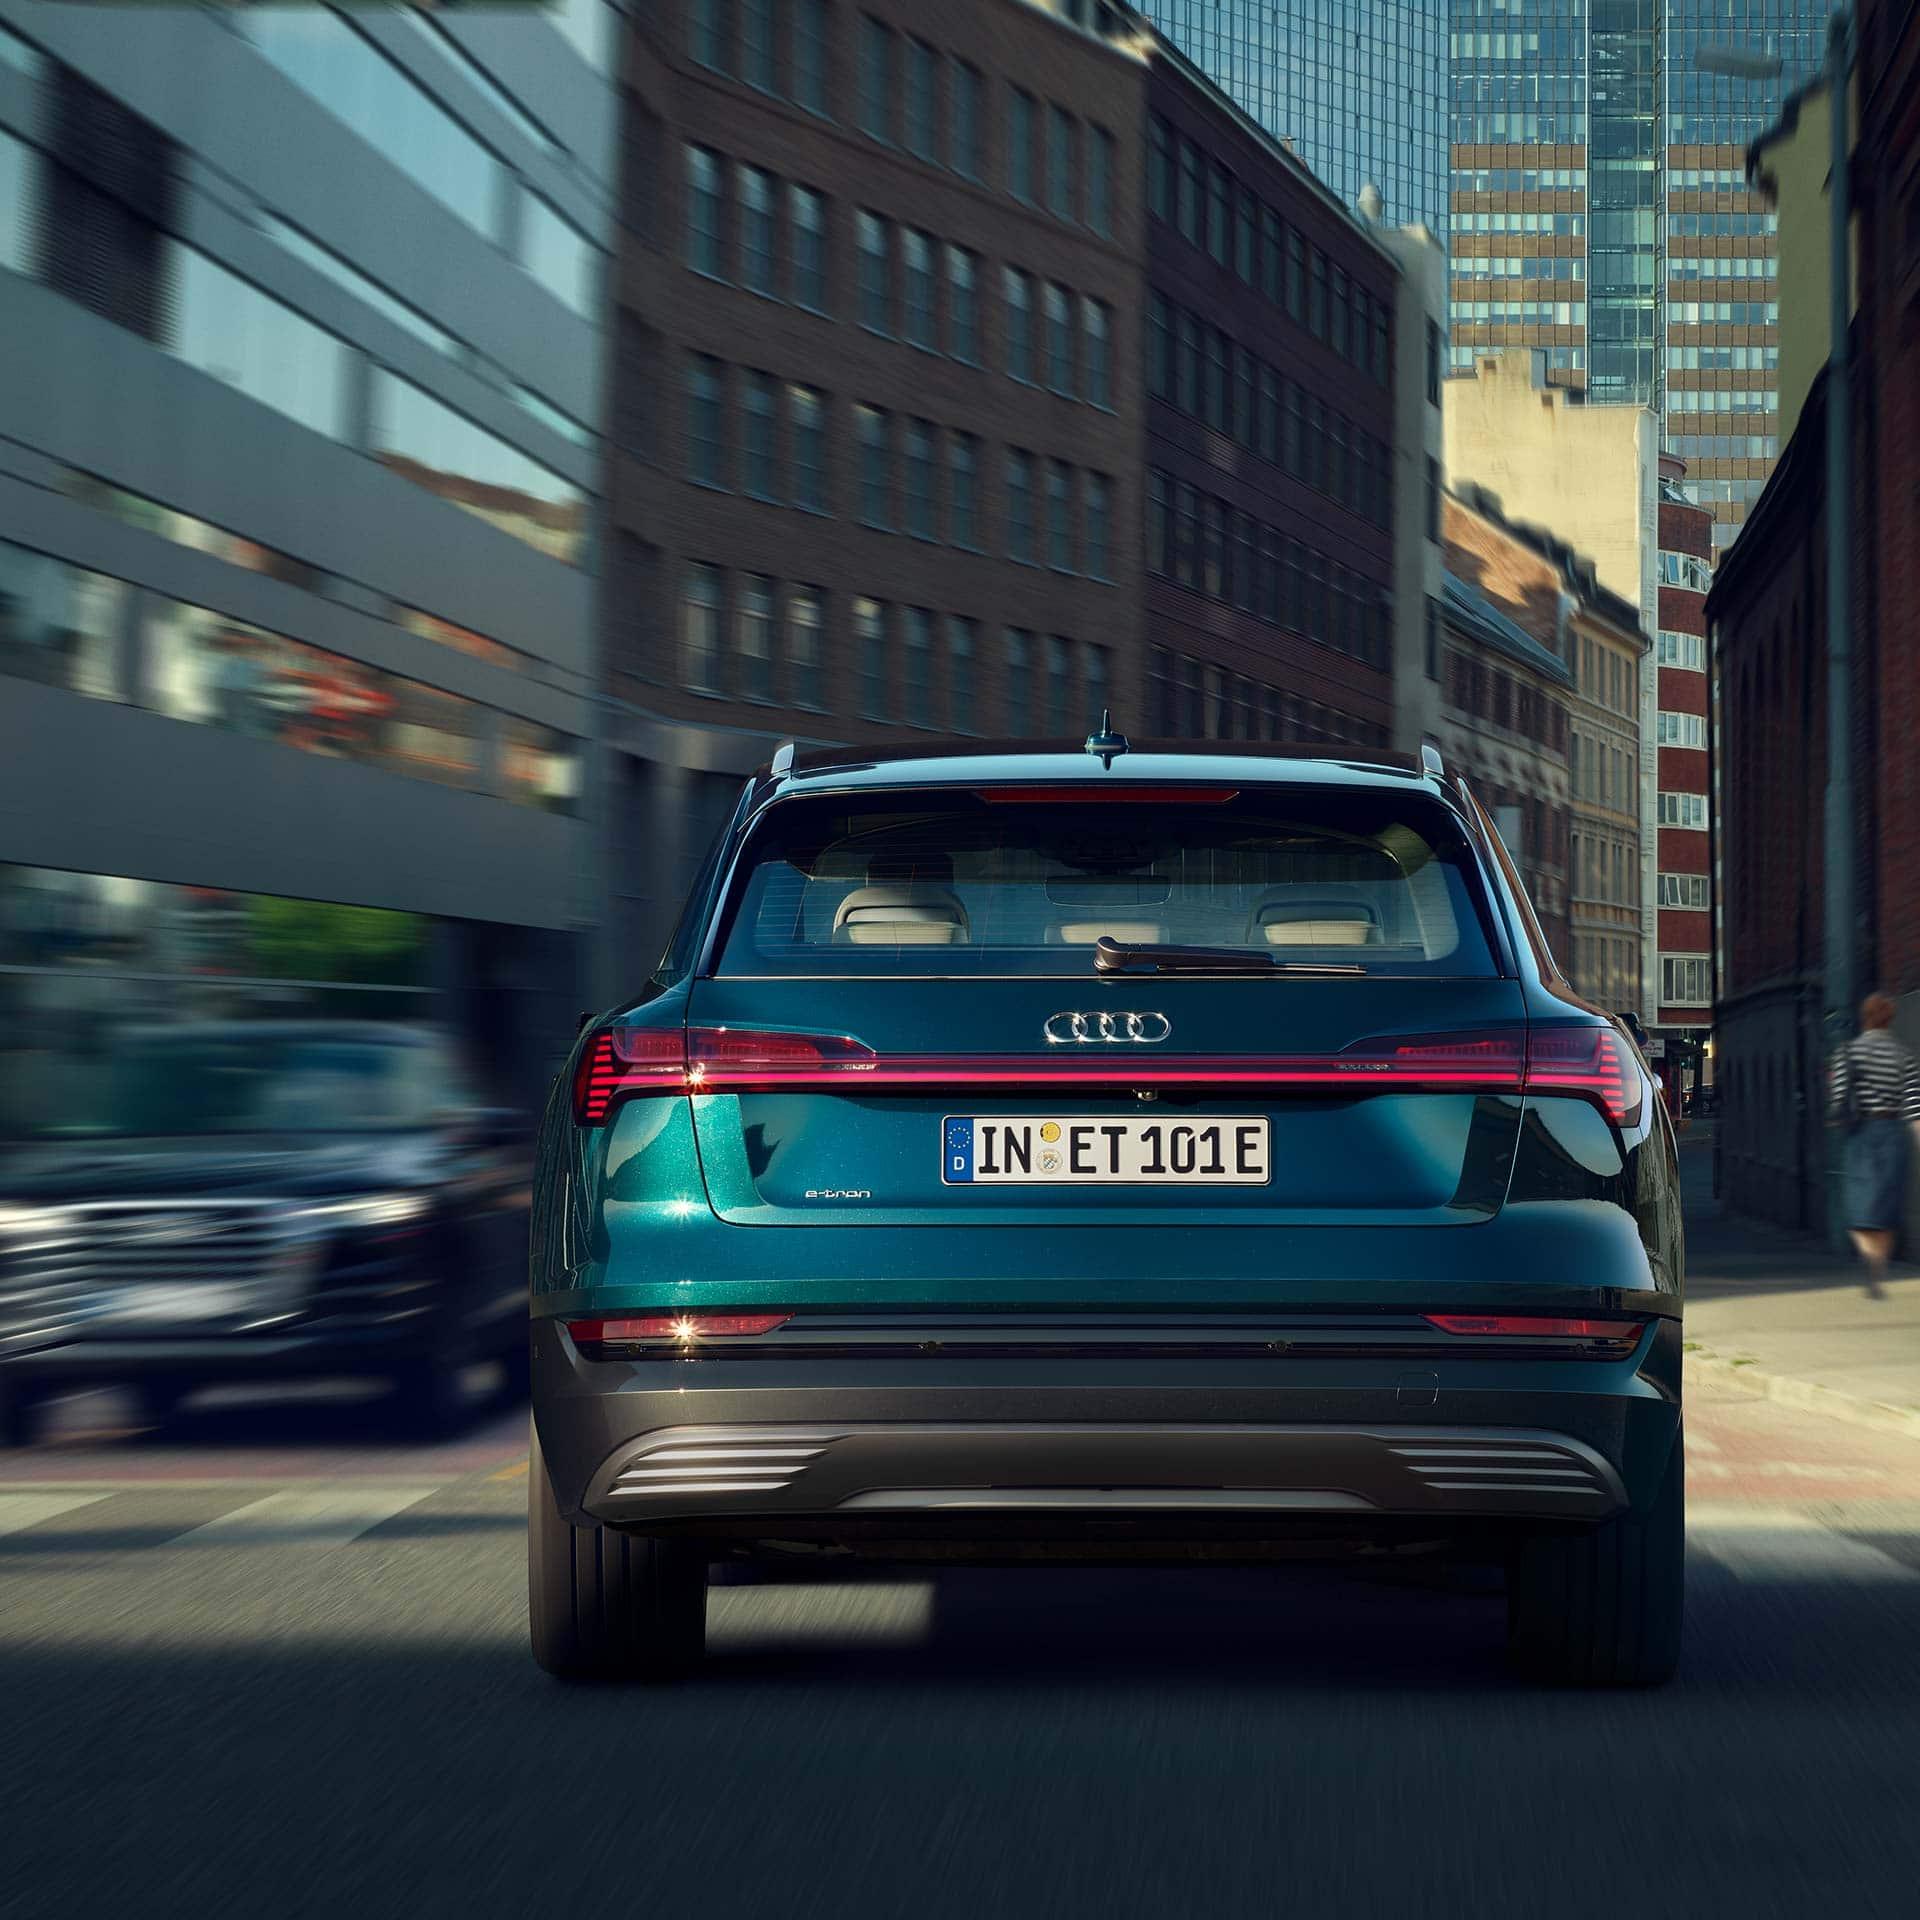 Audi E-tron: Der Elektro-SUV Von Audi